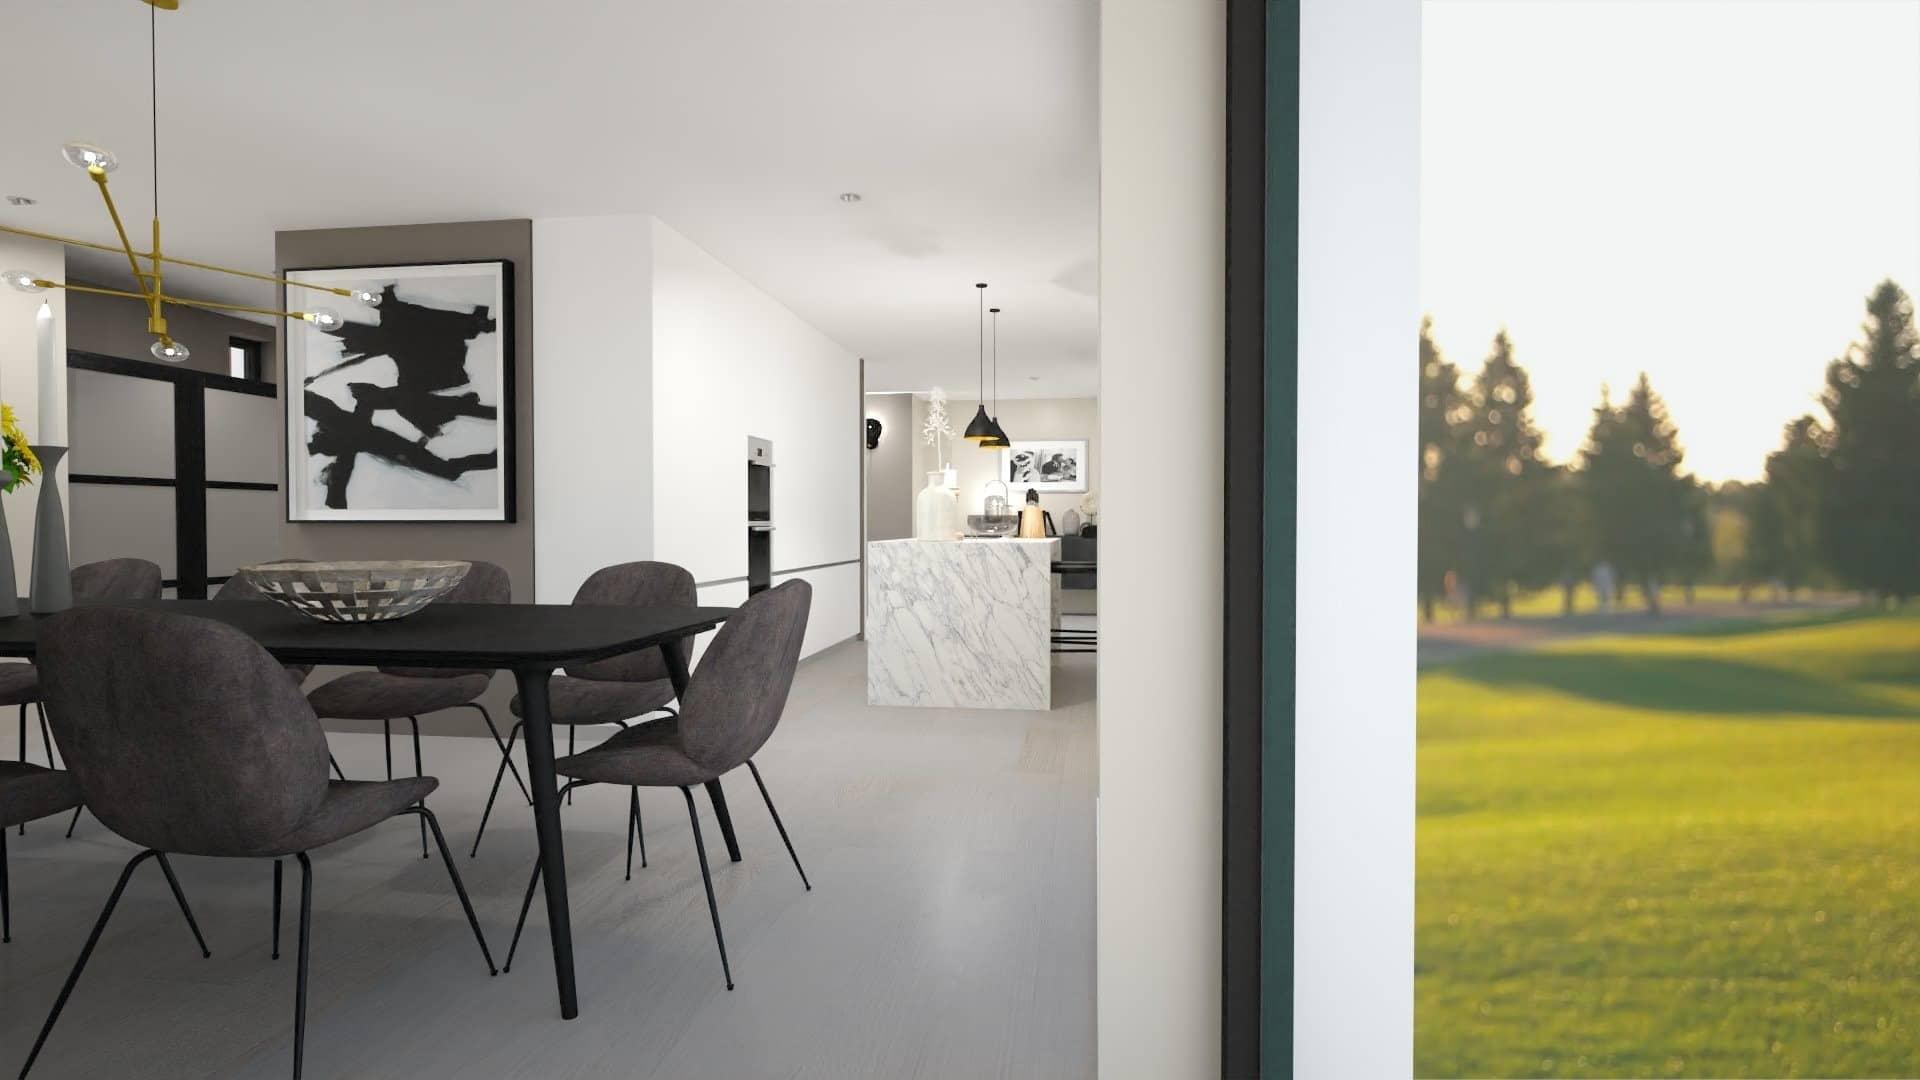 Interior design, Architecture, Home, Building, Furniture, House, Property, Room, White